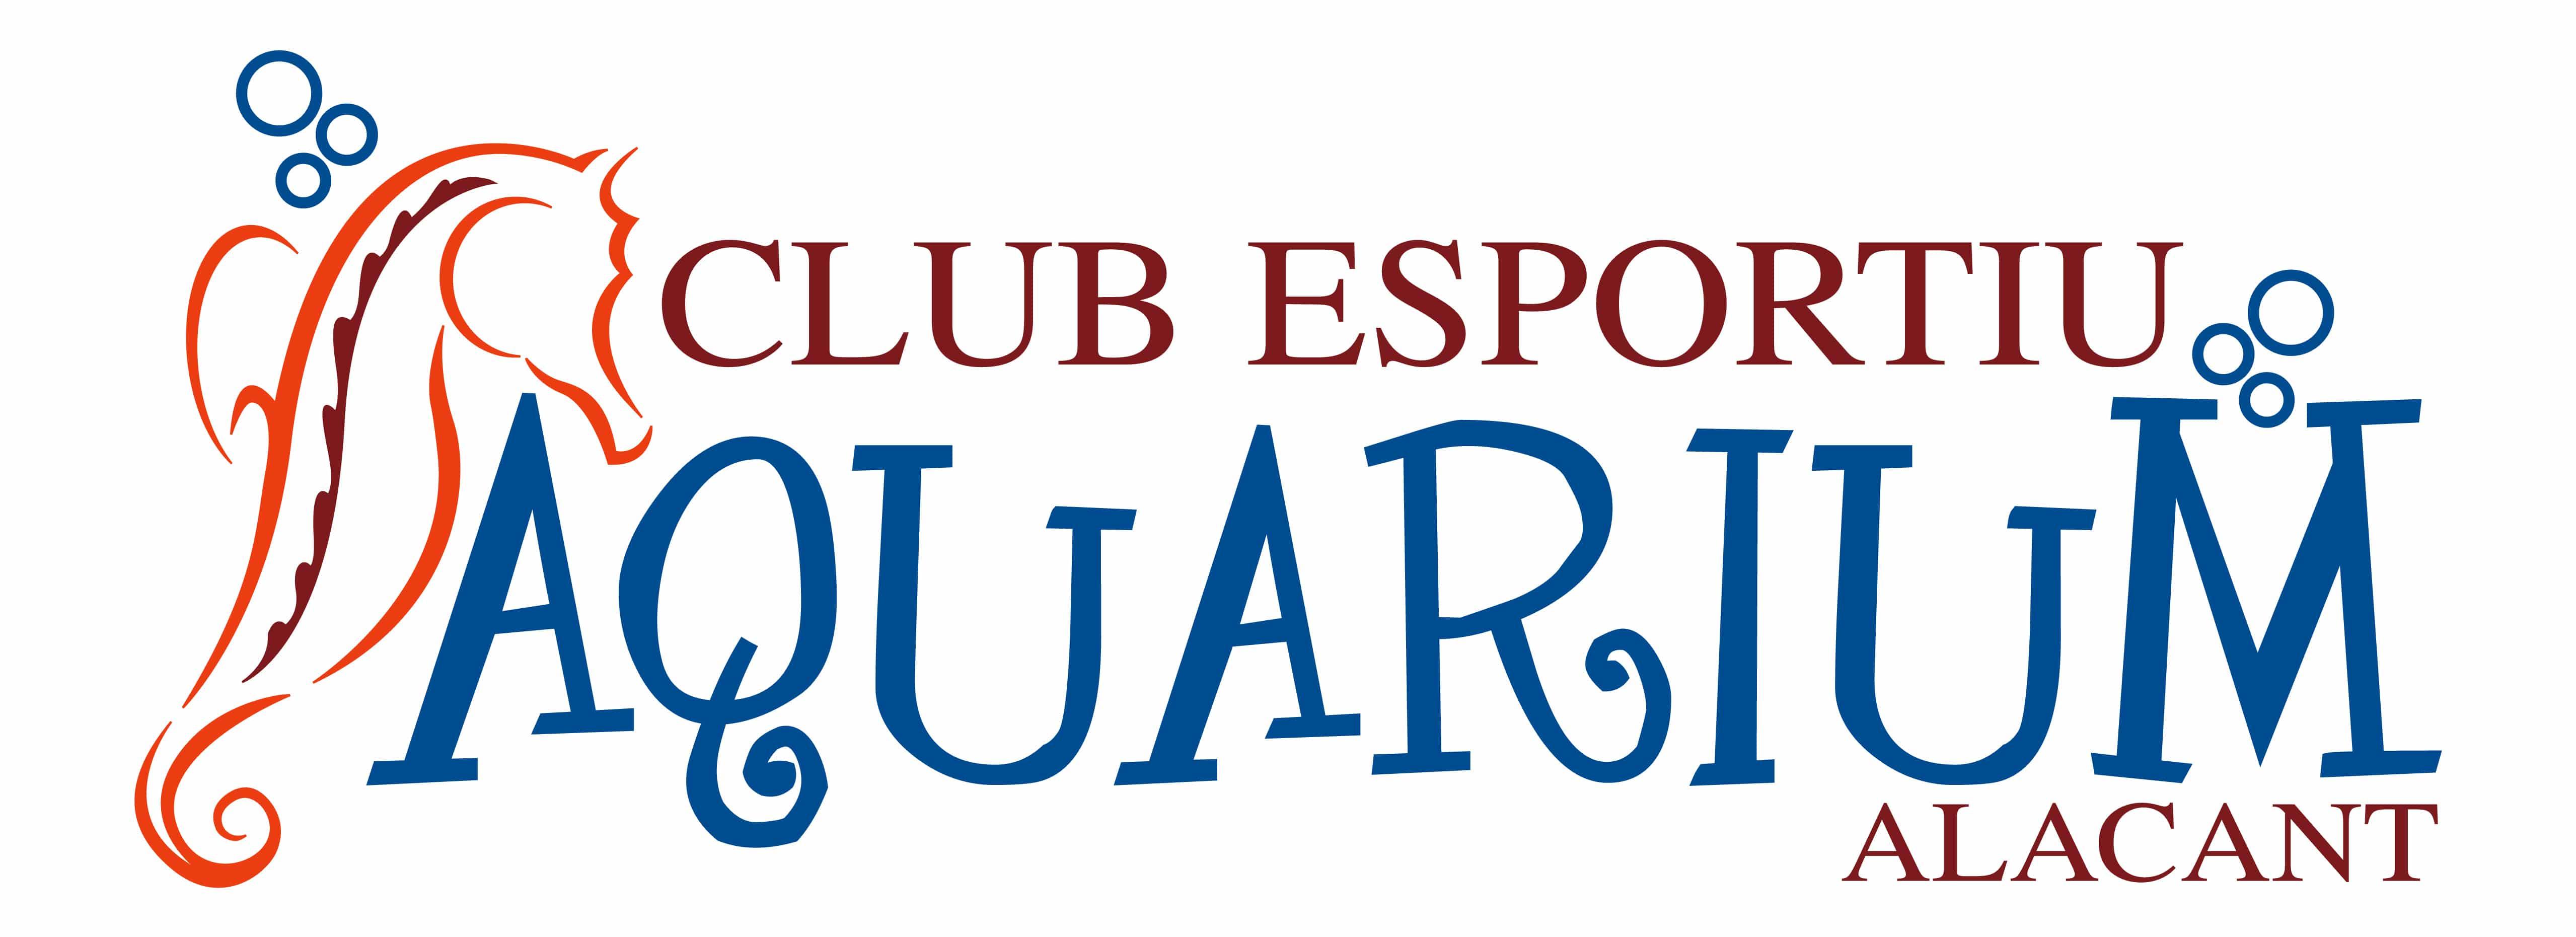 Club Esportiu Aquarium Alacant